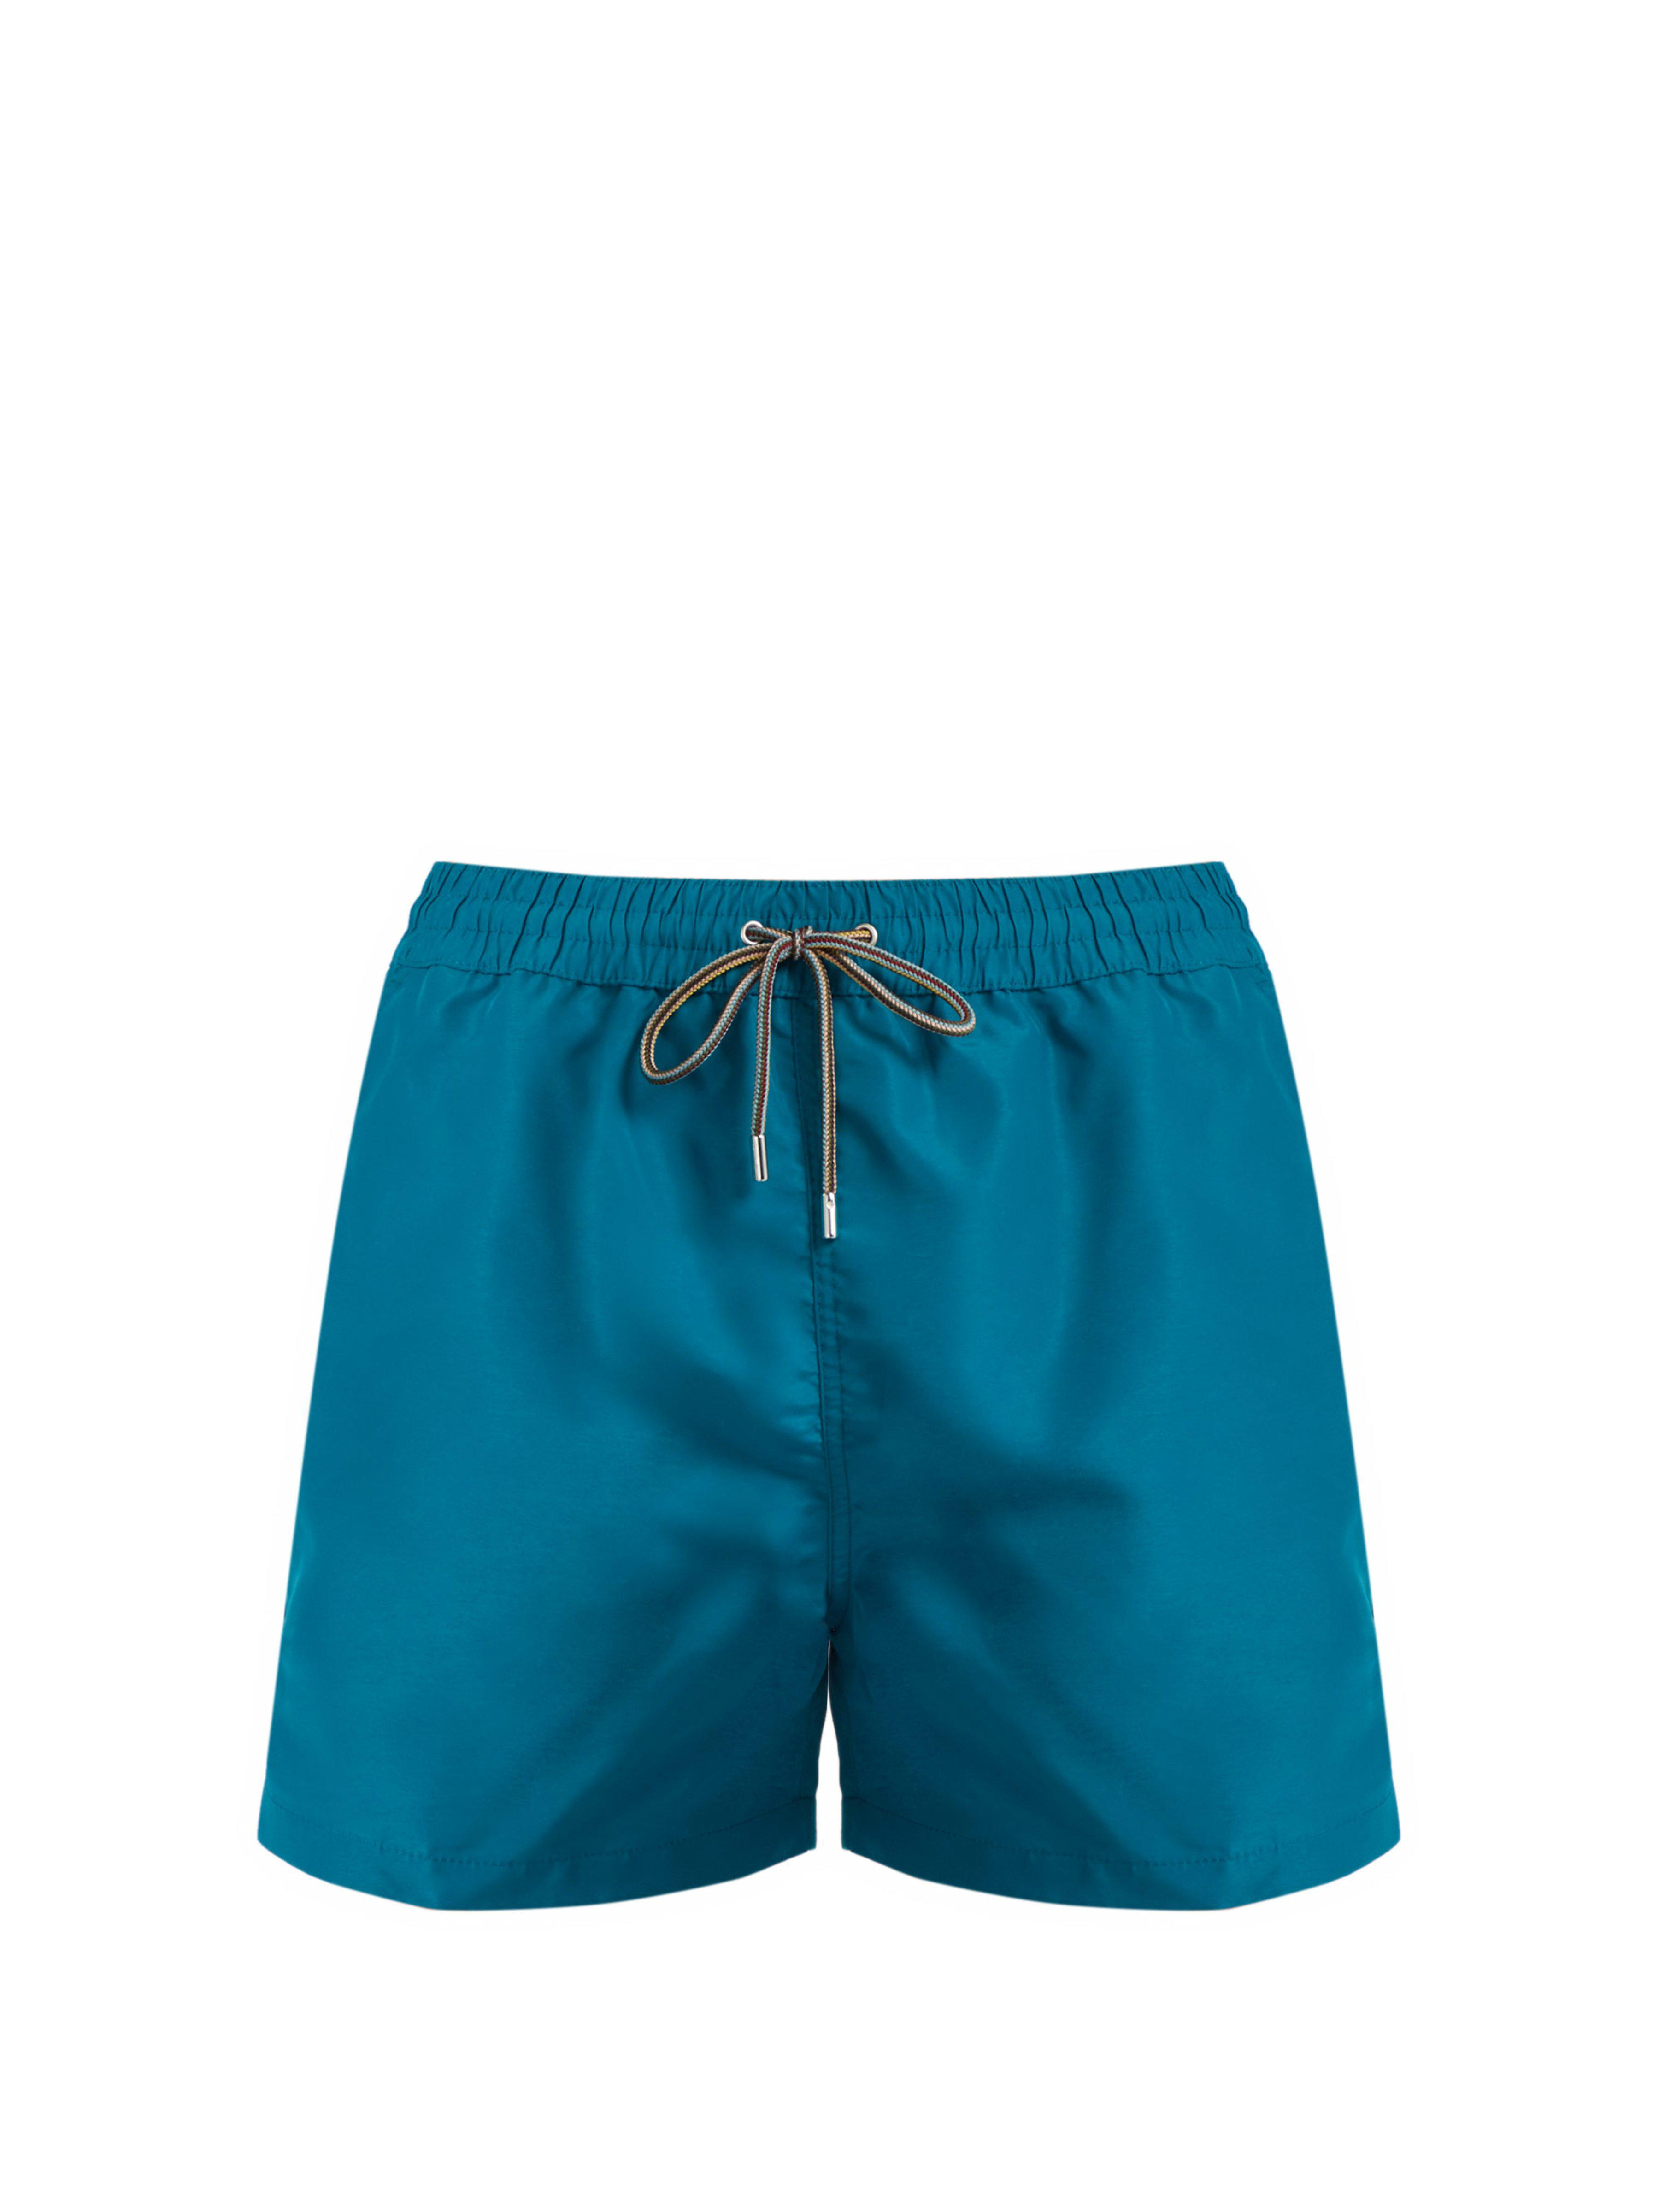 f02829773c Paul Smith Classic Swim Shorts in Green for Men - Lyst